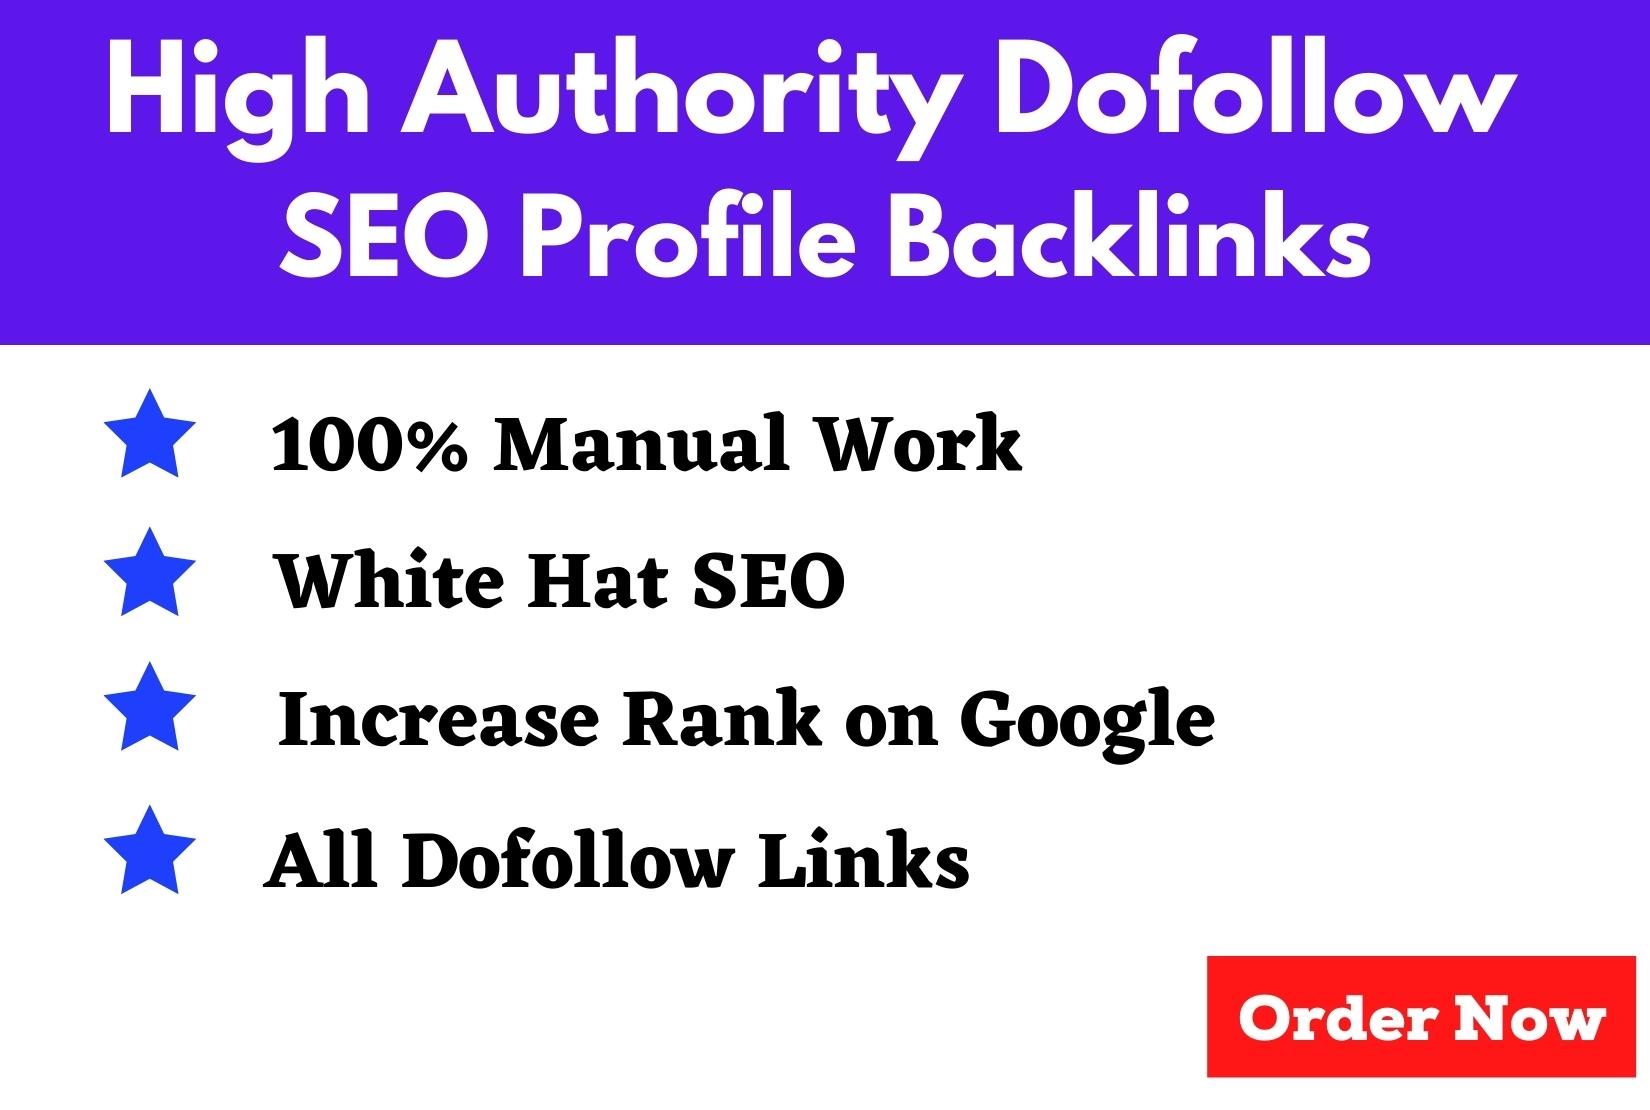 200 high authority dofollow SEO profile backlinks